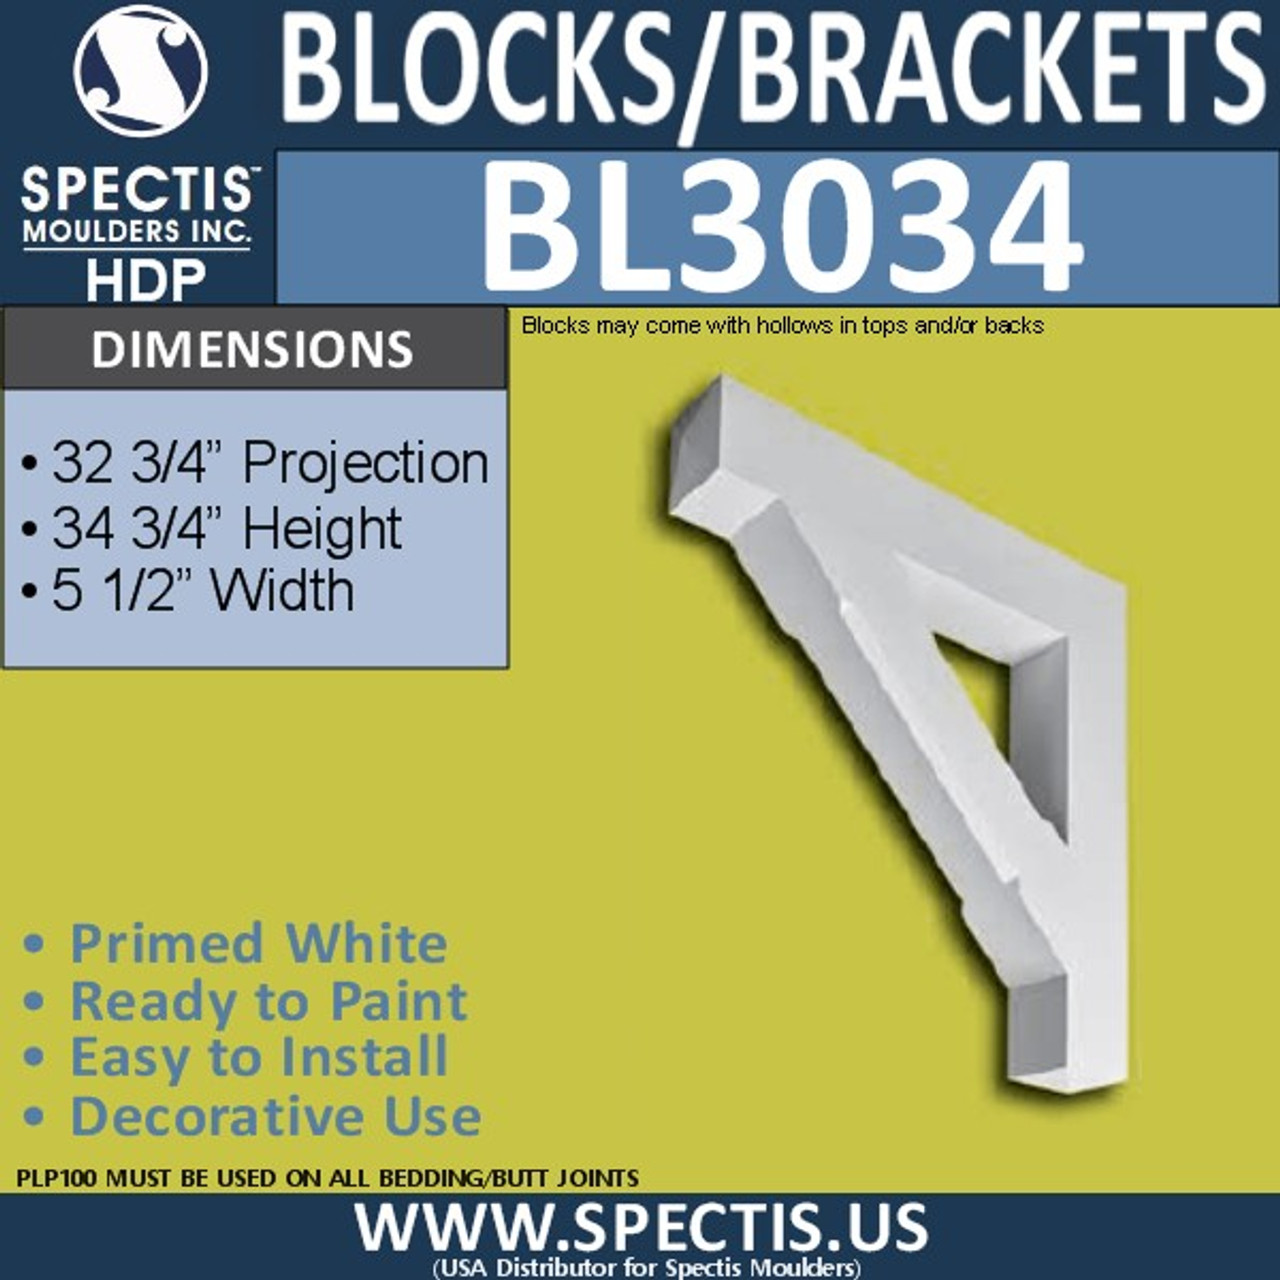 "BL3034 Eave Block or Bracket 5.5""W x 34.75""H x 32.75"" P"